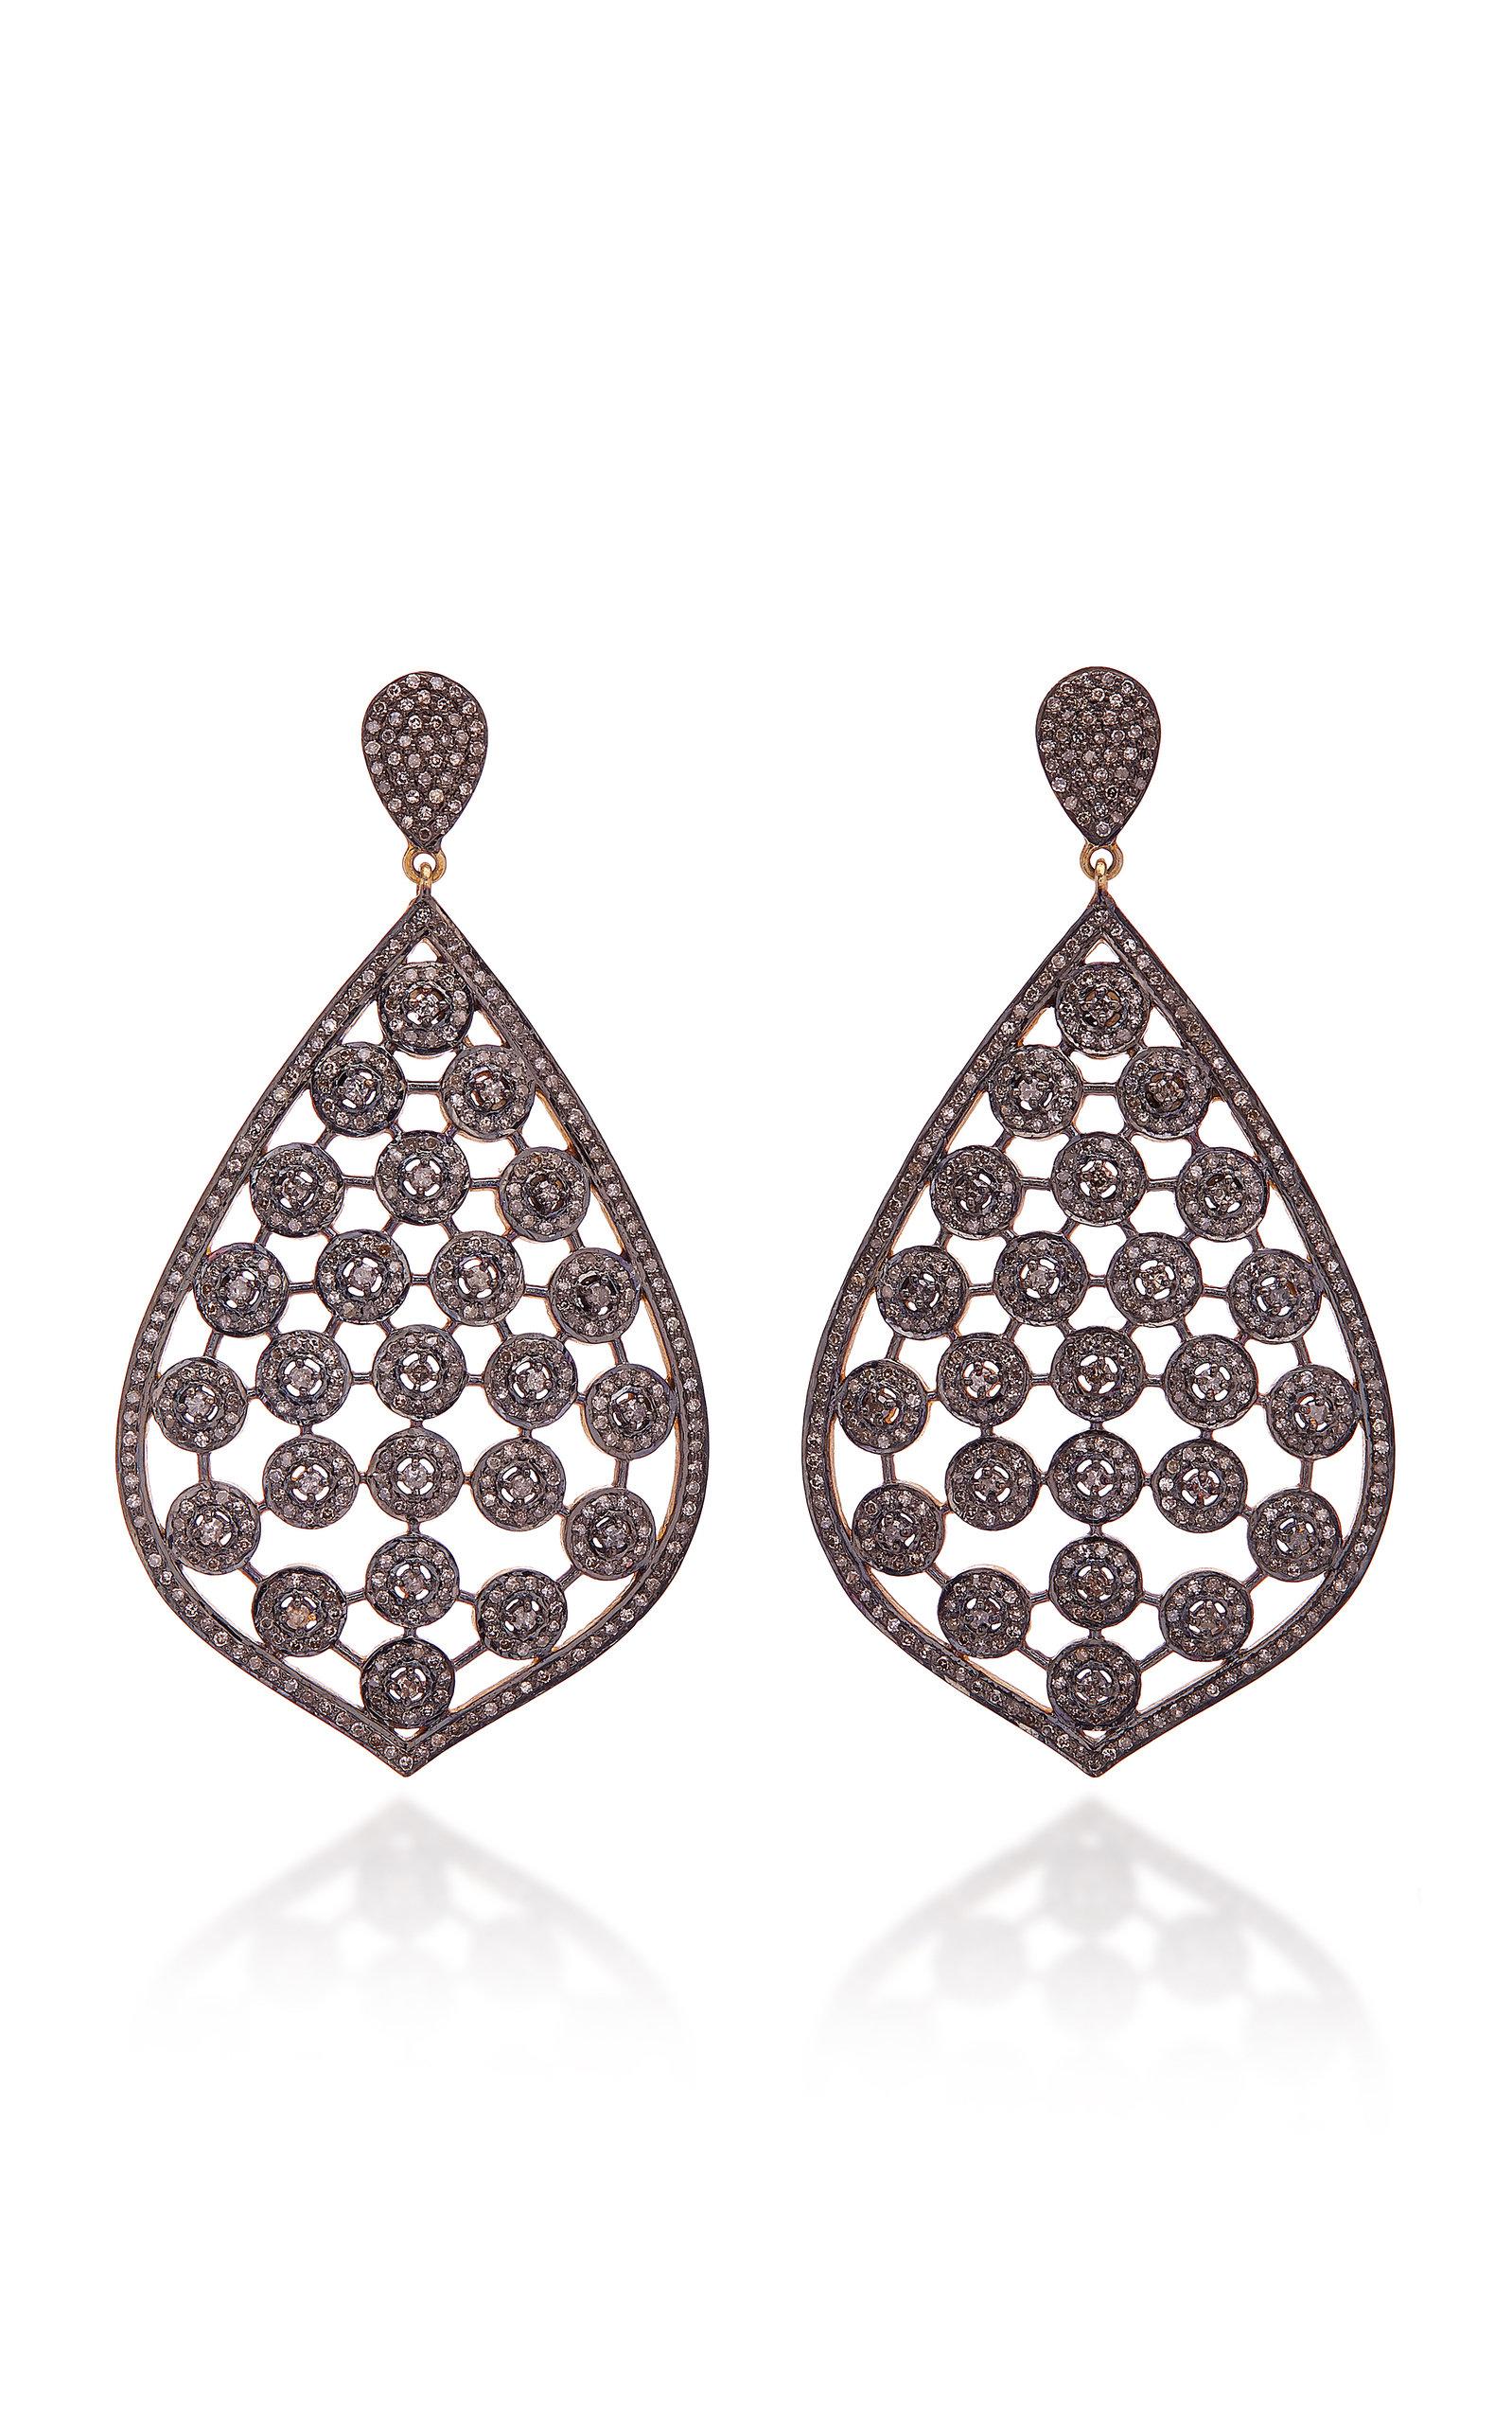 SANJAY KASLIWAL 14K Gold Silver And Pavé Diamond Earrings in Grey